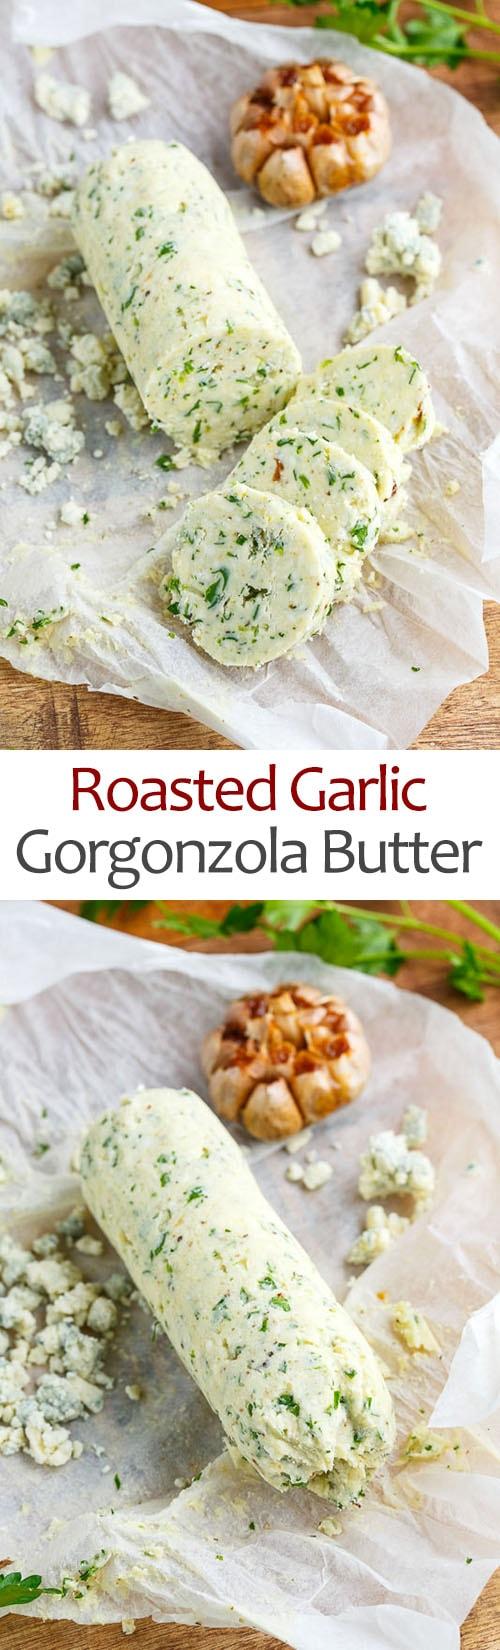 Roasted Garlic Gorgonzola Butter